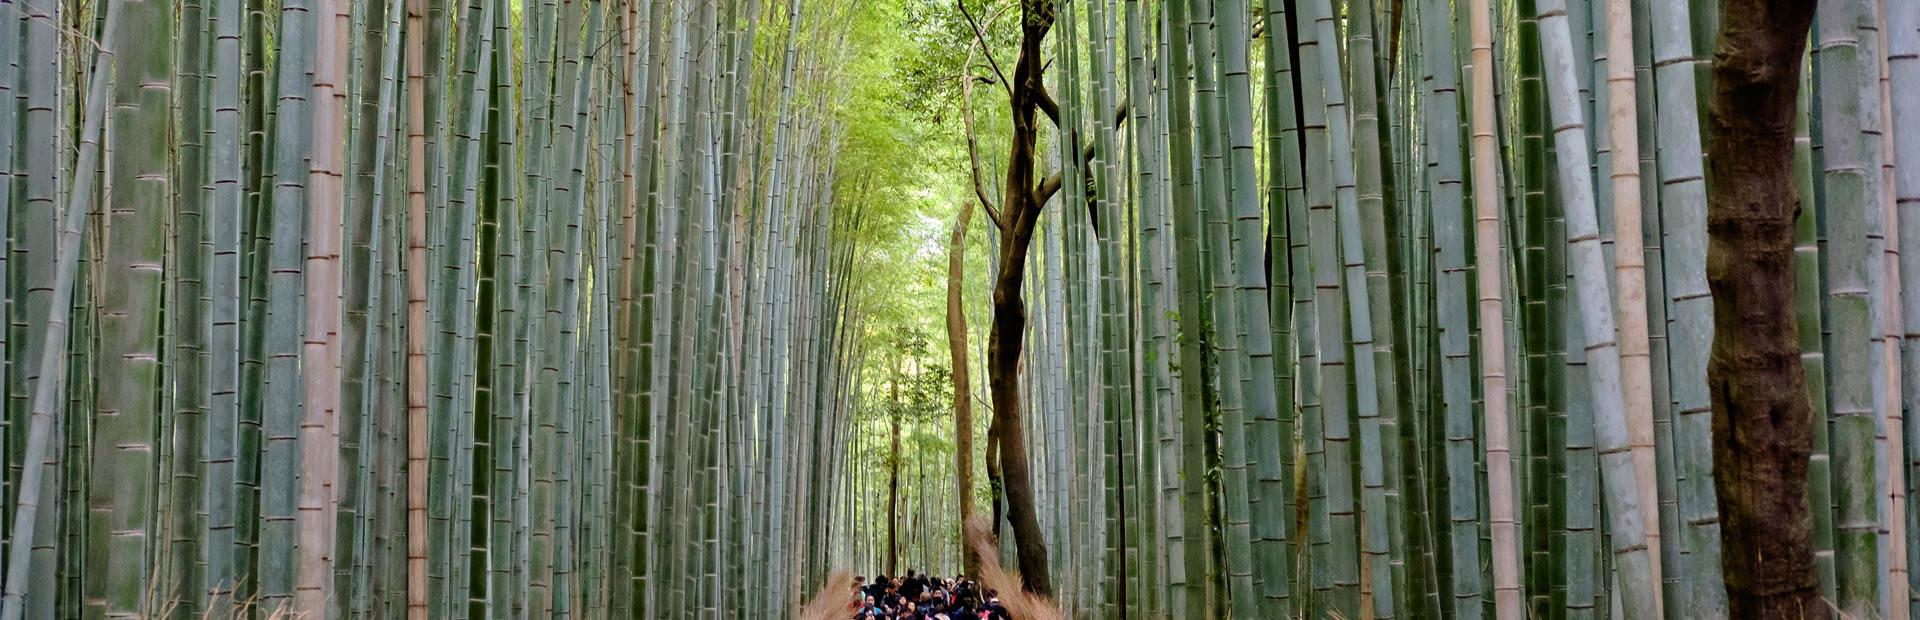 Konnichiwa Japón y Filipinas 14 dias 5